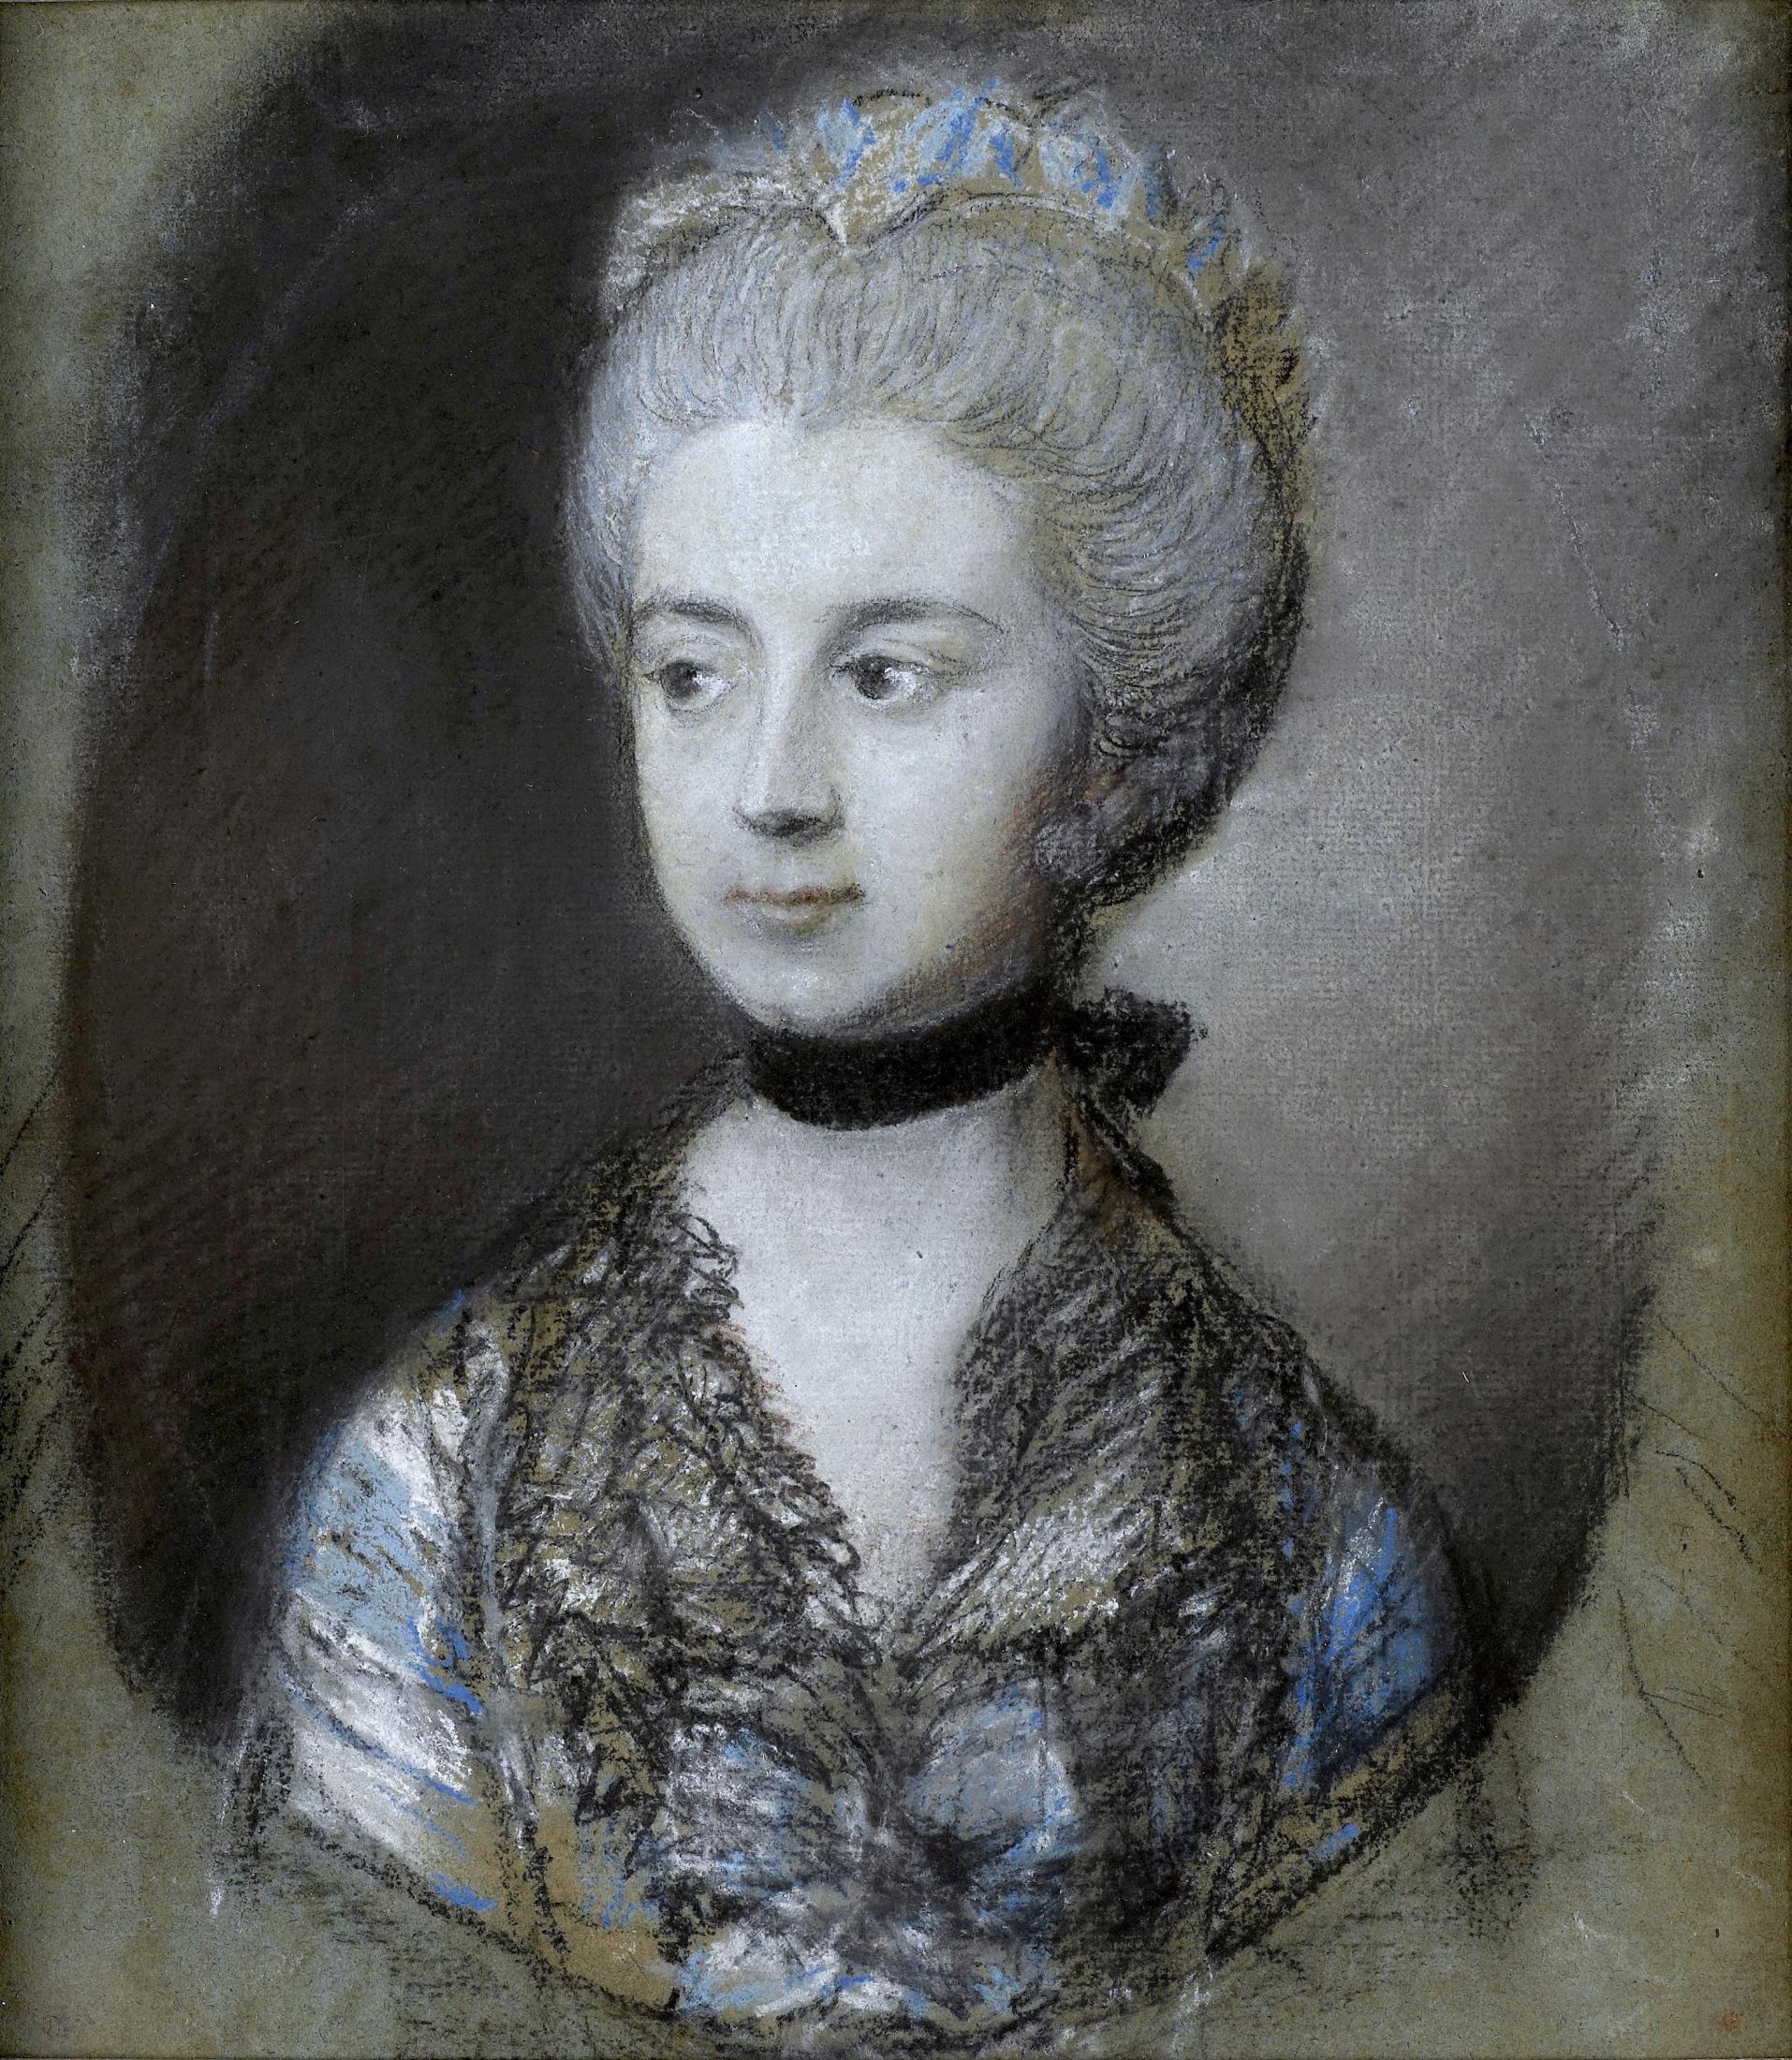 Portrait of Elizabeth, Duchess of Buccleuch